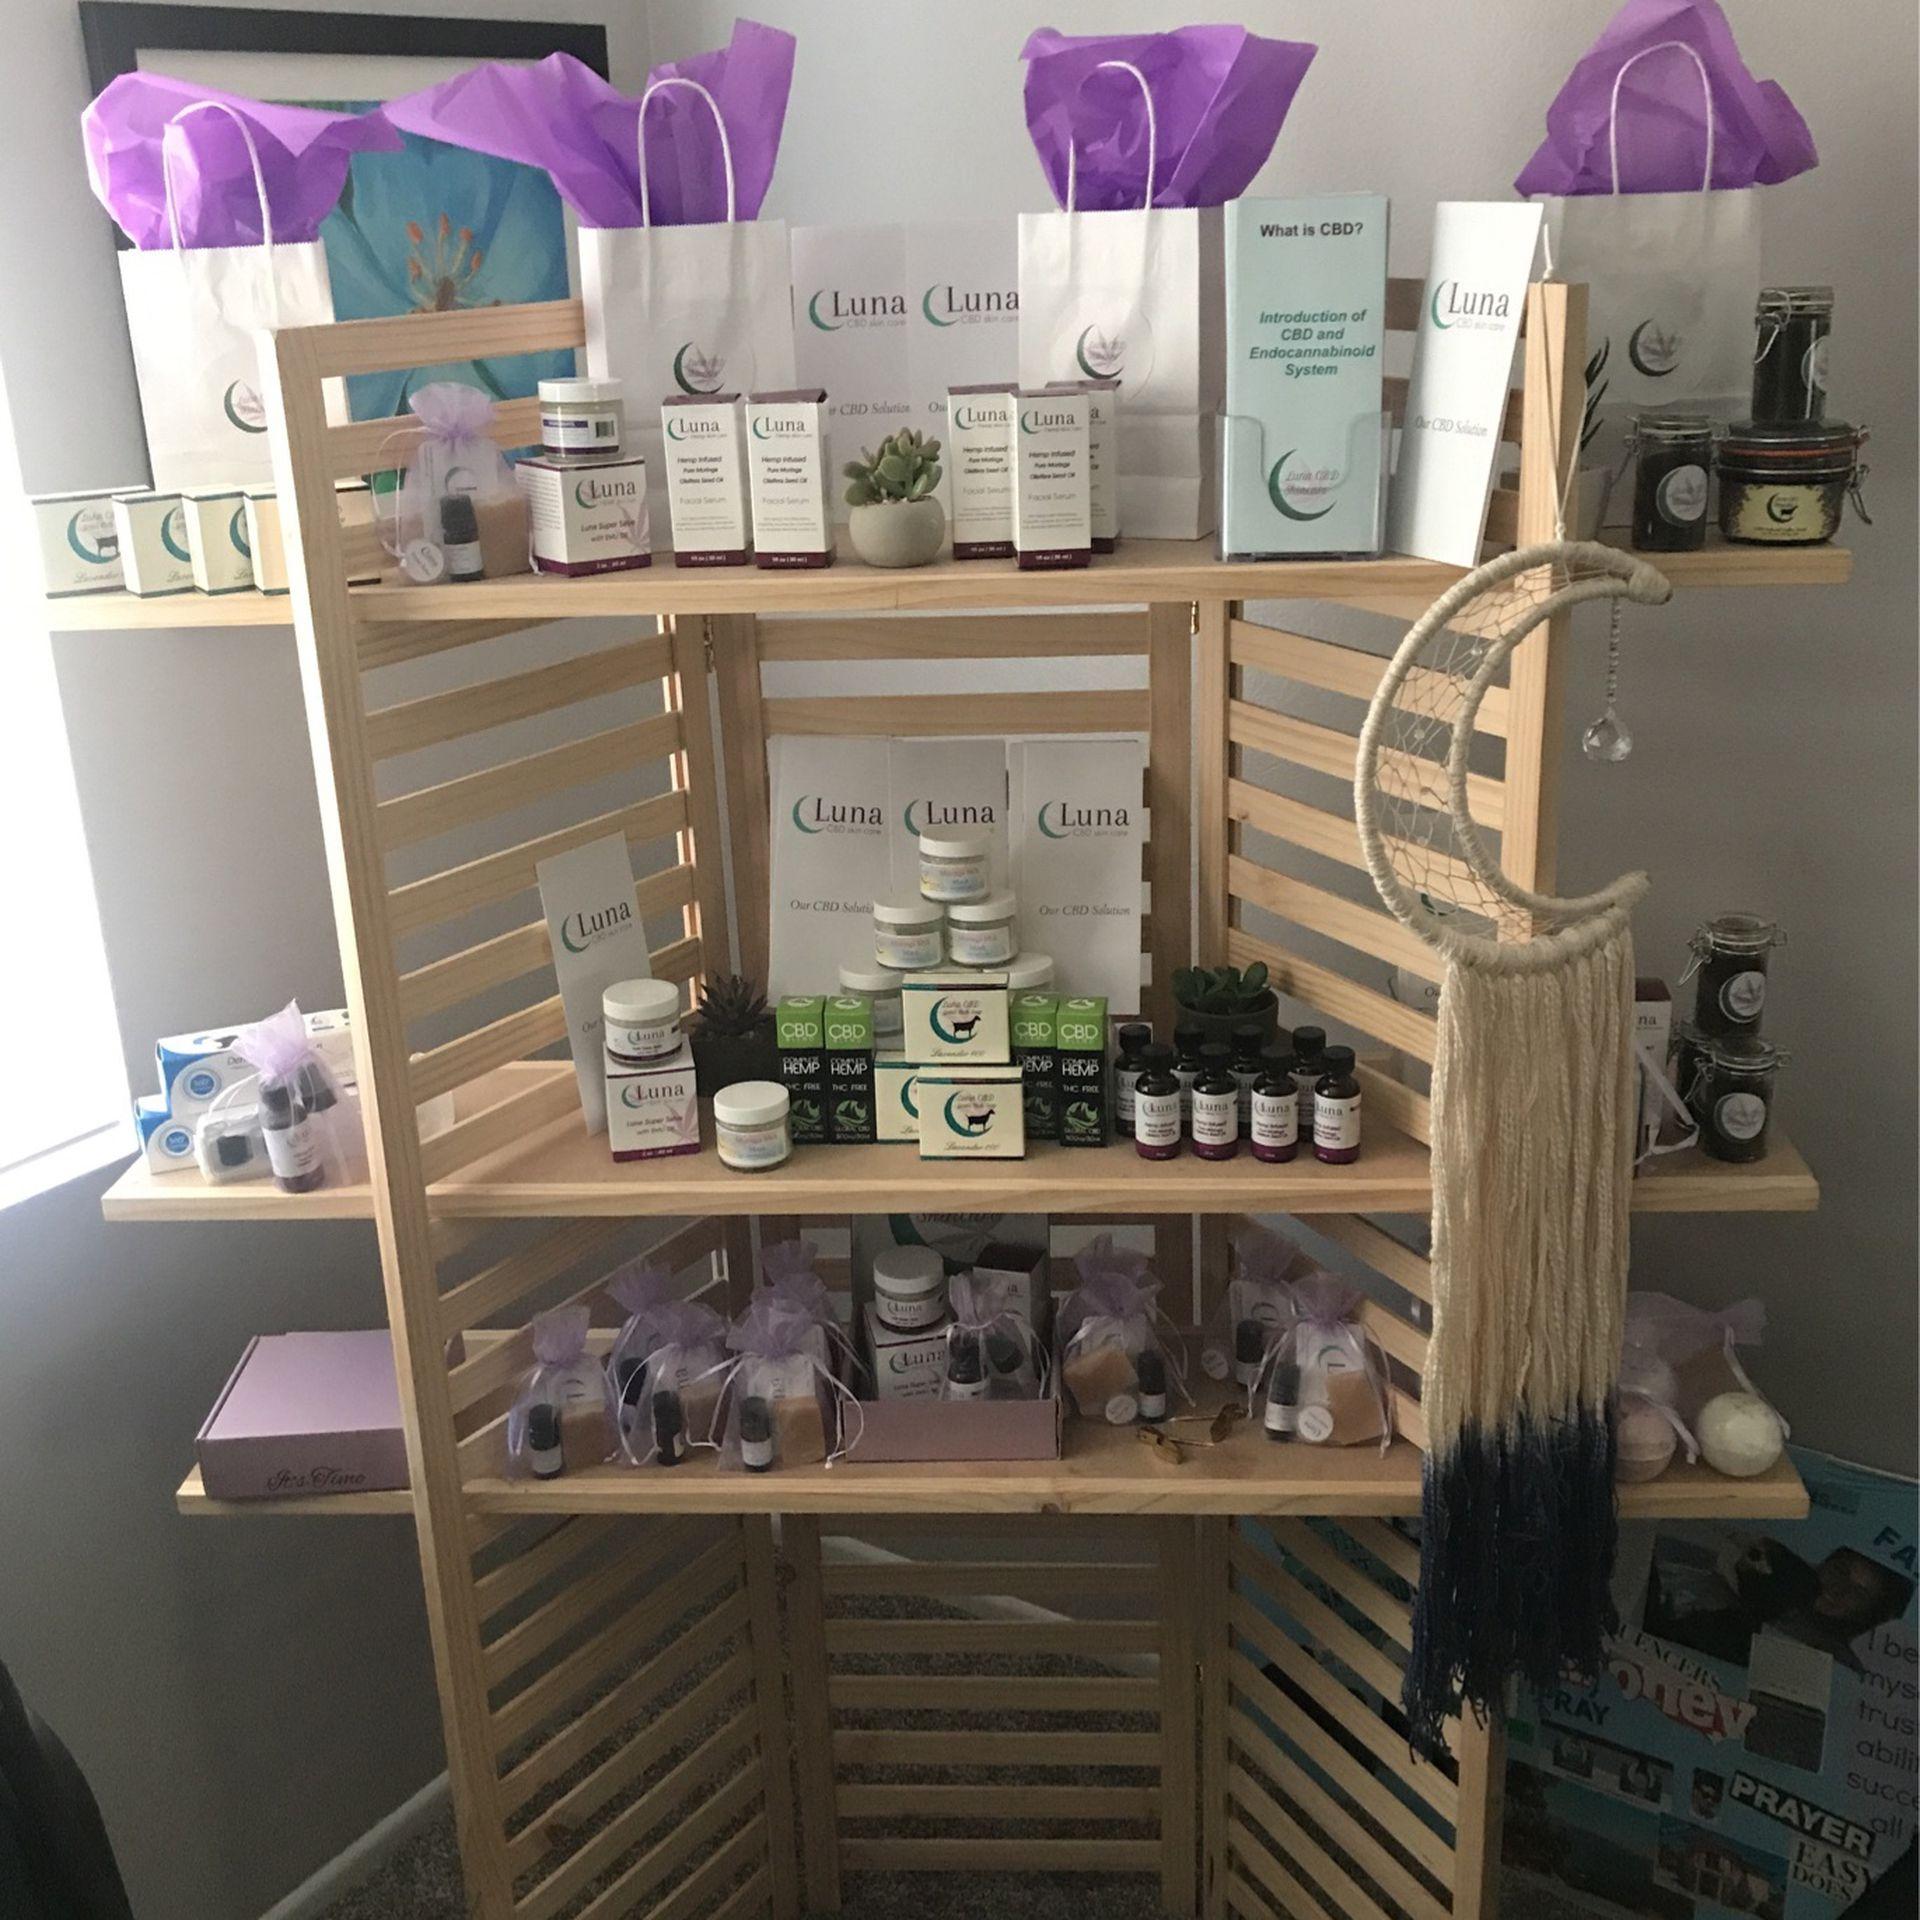 Luna Hemp Infused Skincare Products